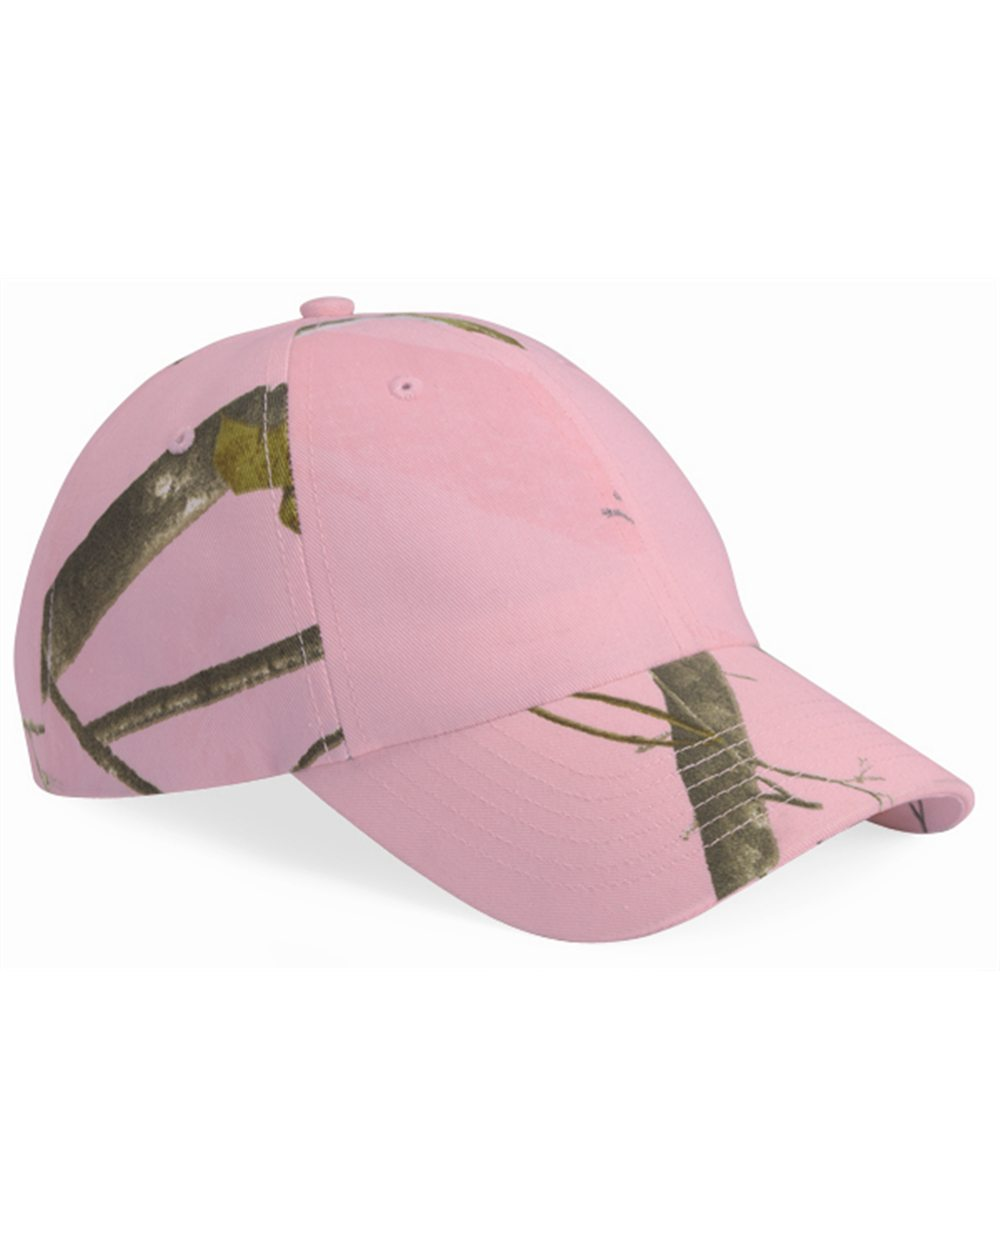 KATI SN20W Realtree All-Purpose Pink Cap